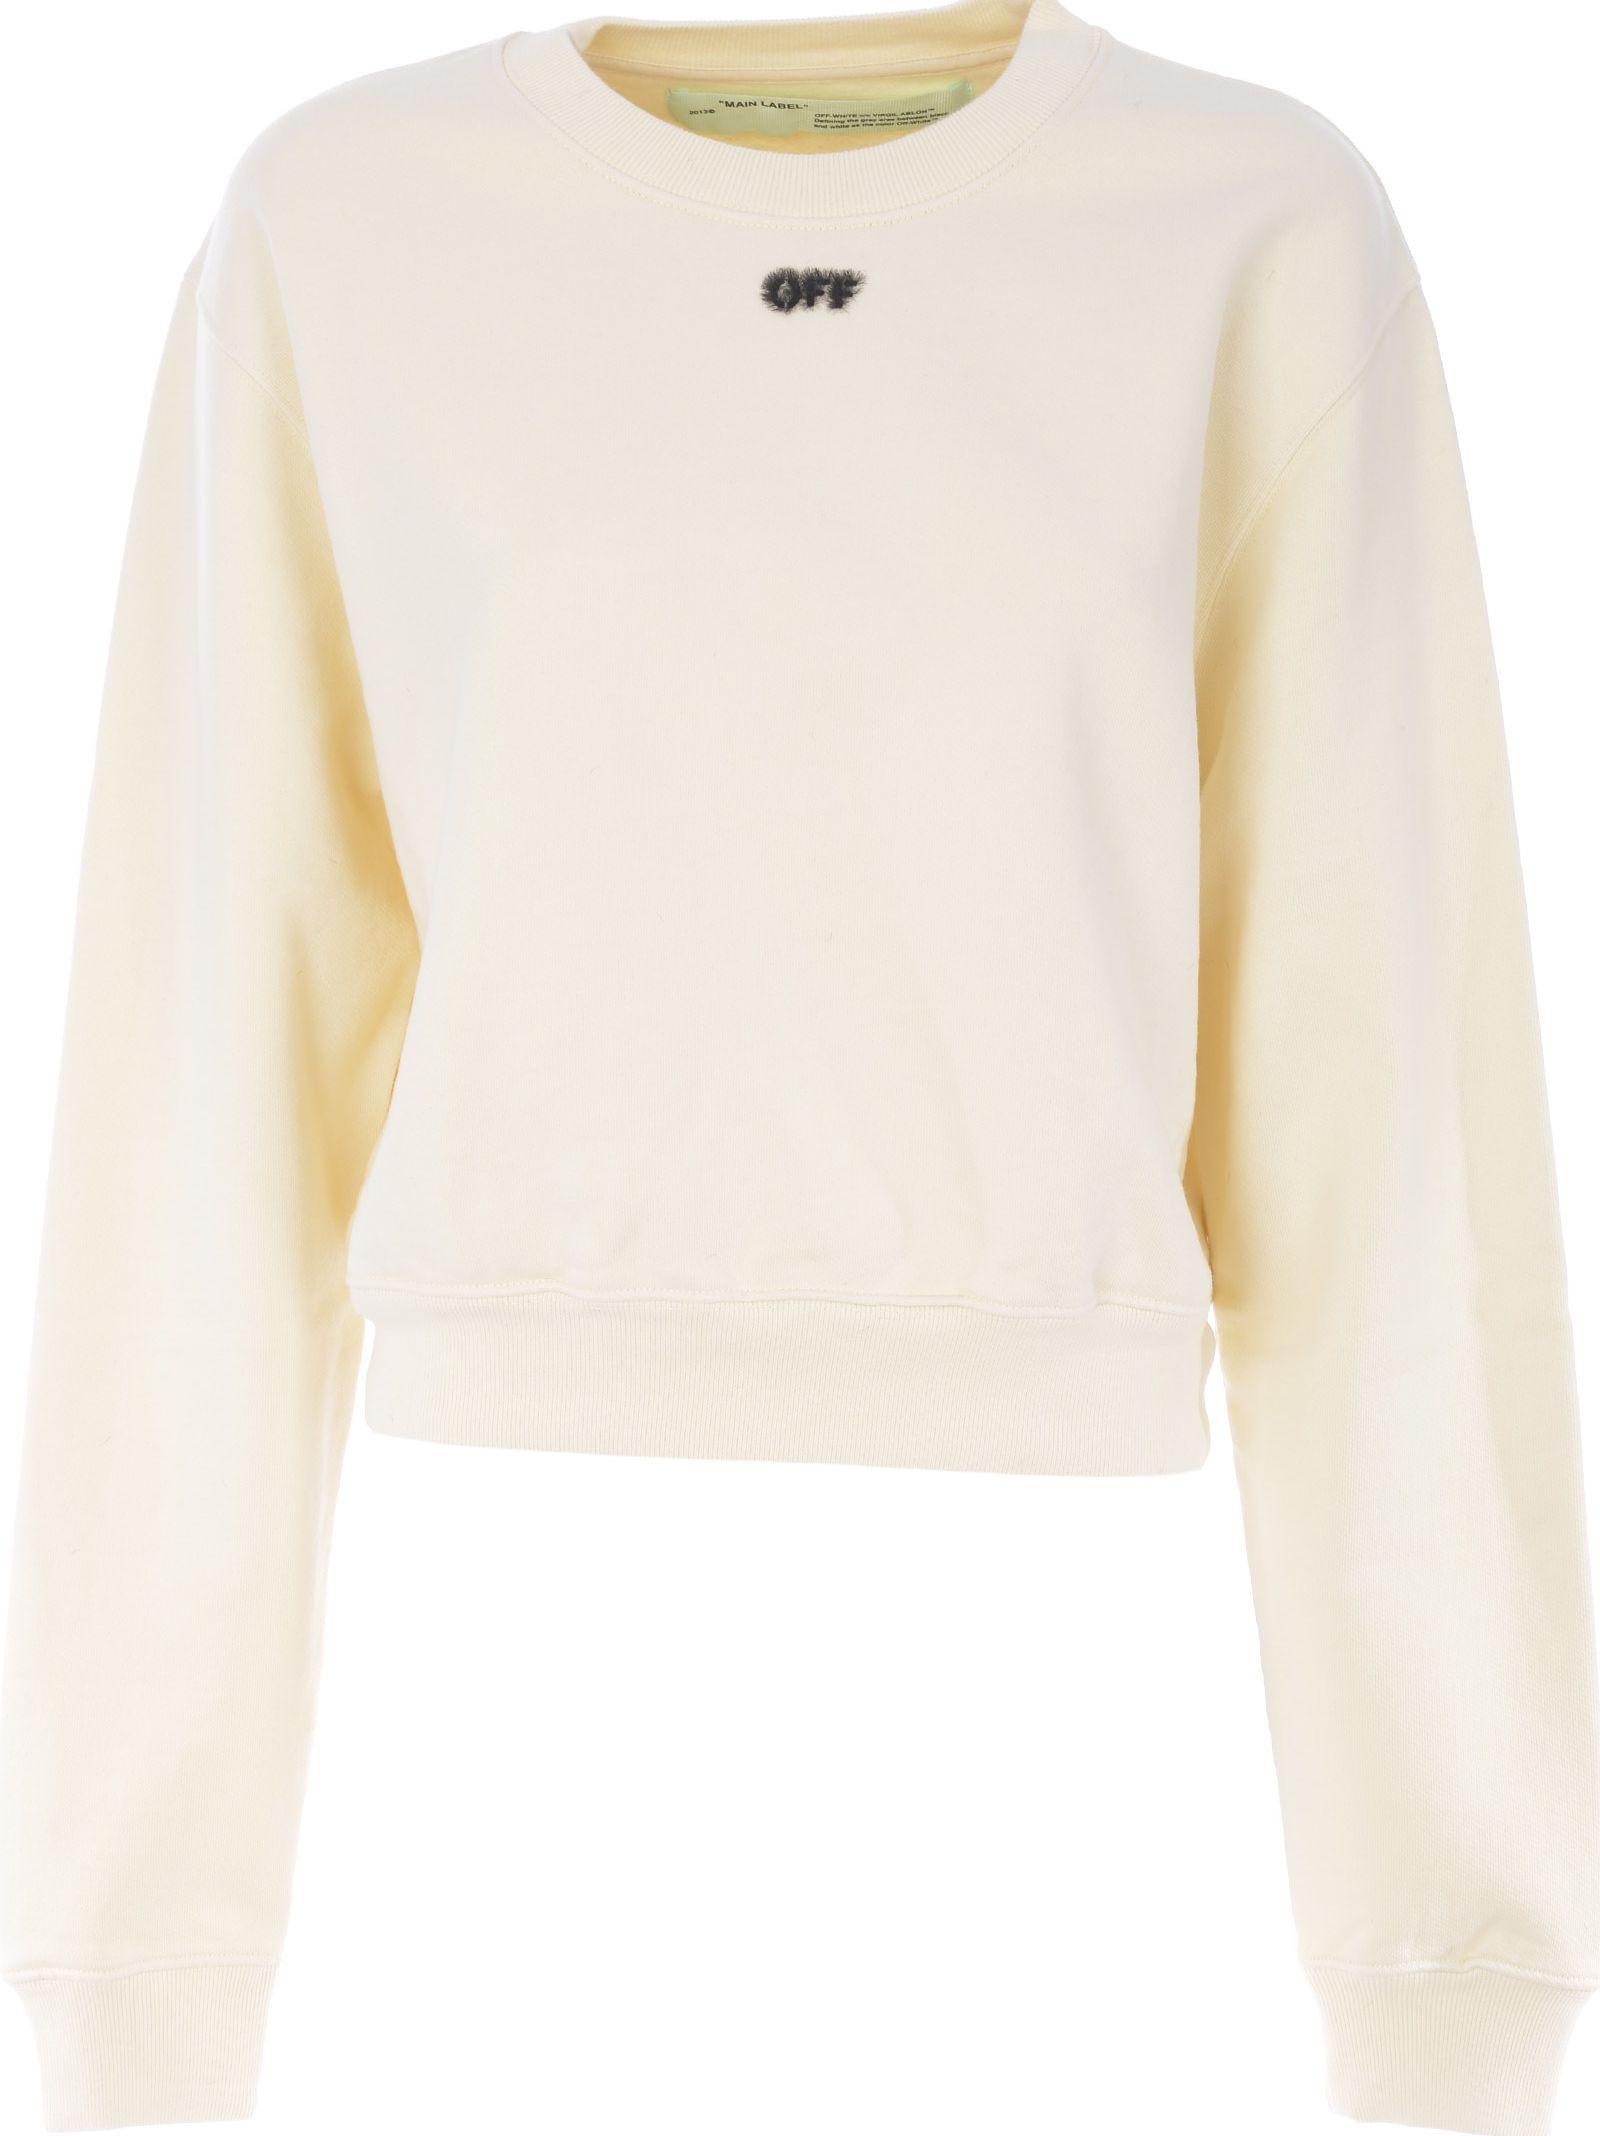 Off-white Eyelash Logo Sweatshirt